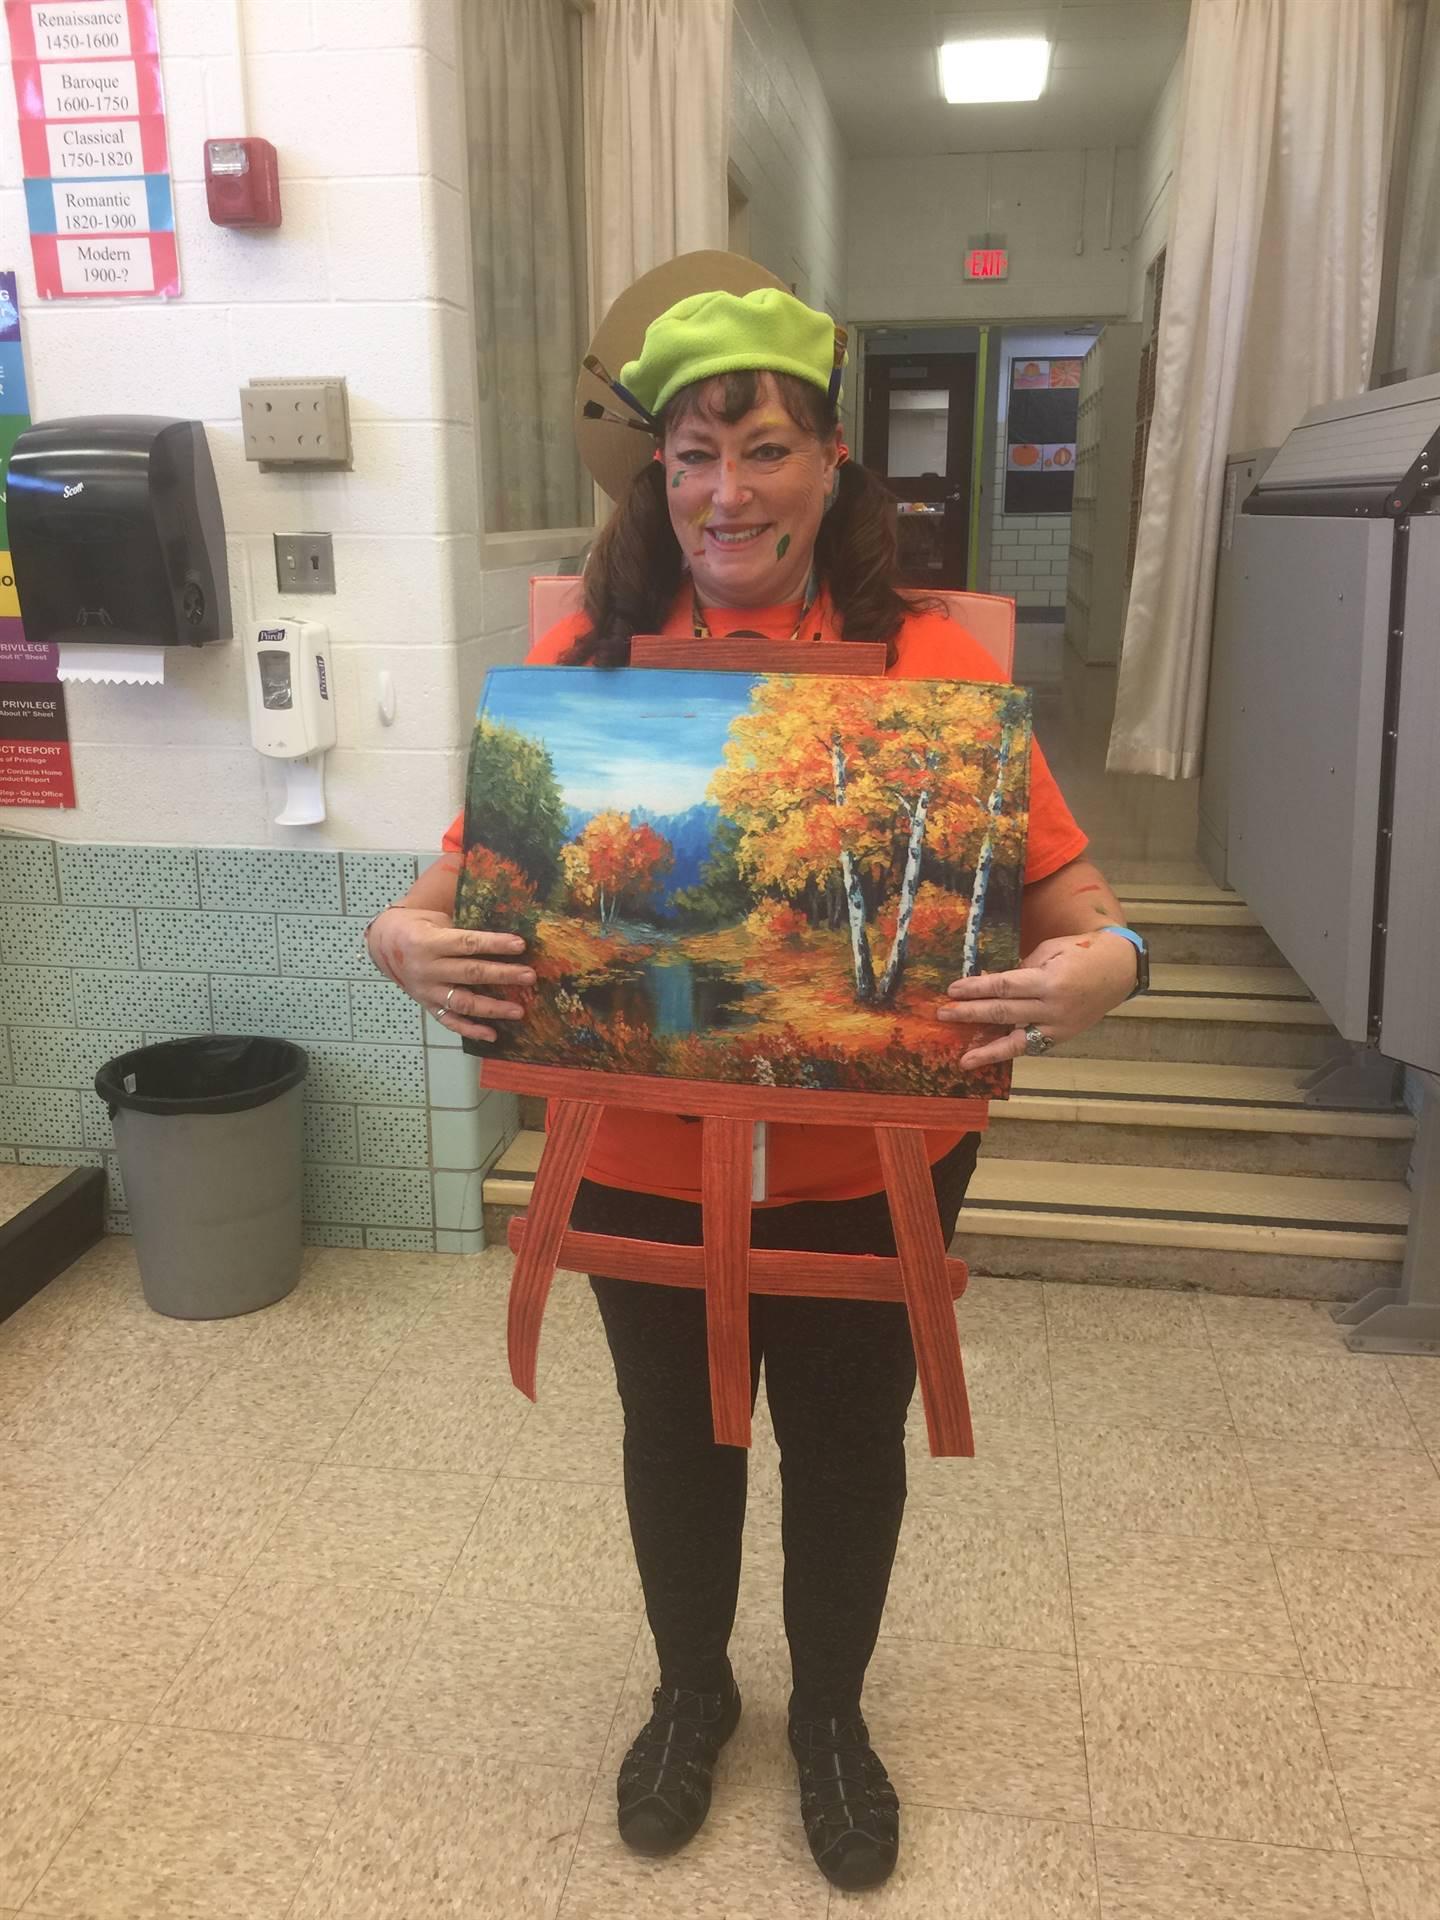 Our Art Teacher in Costume